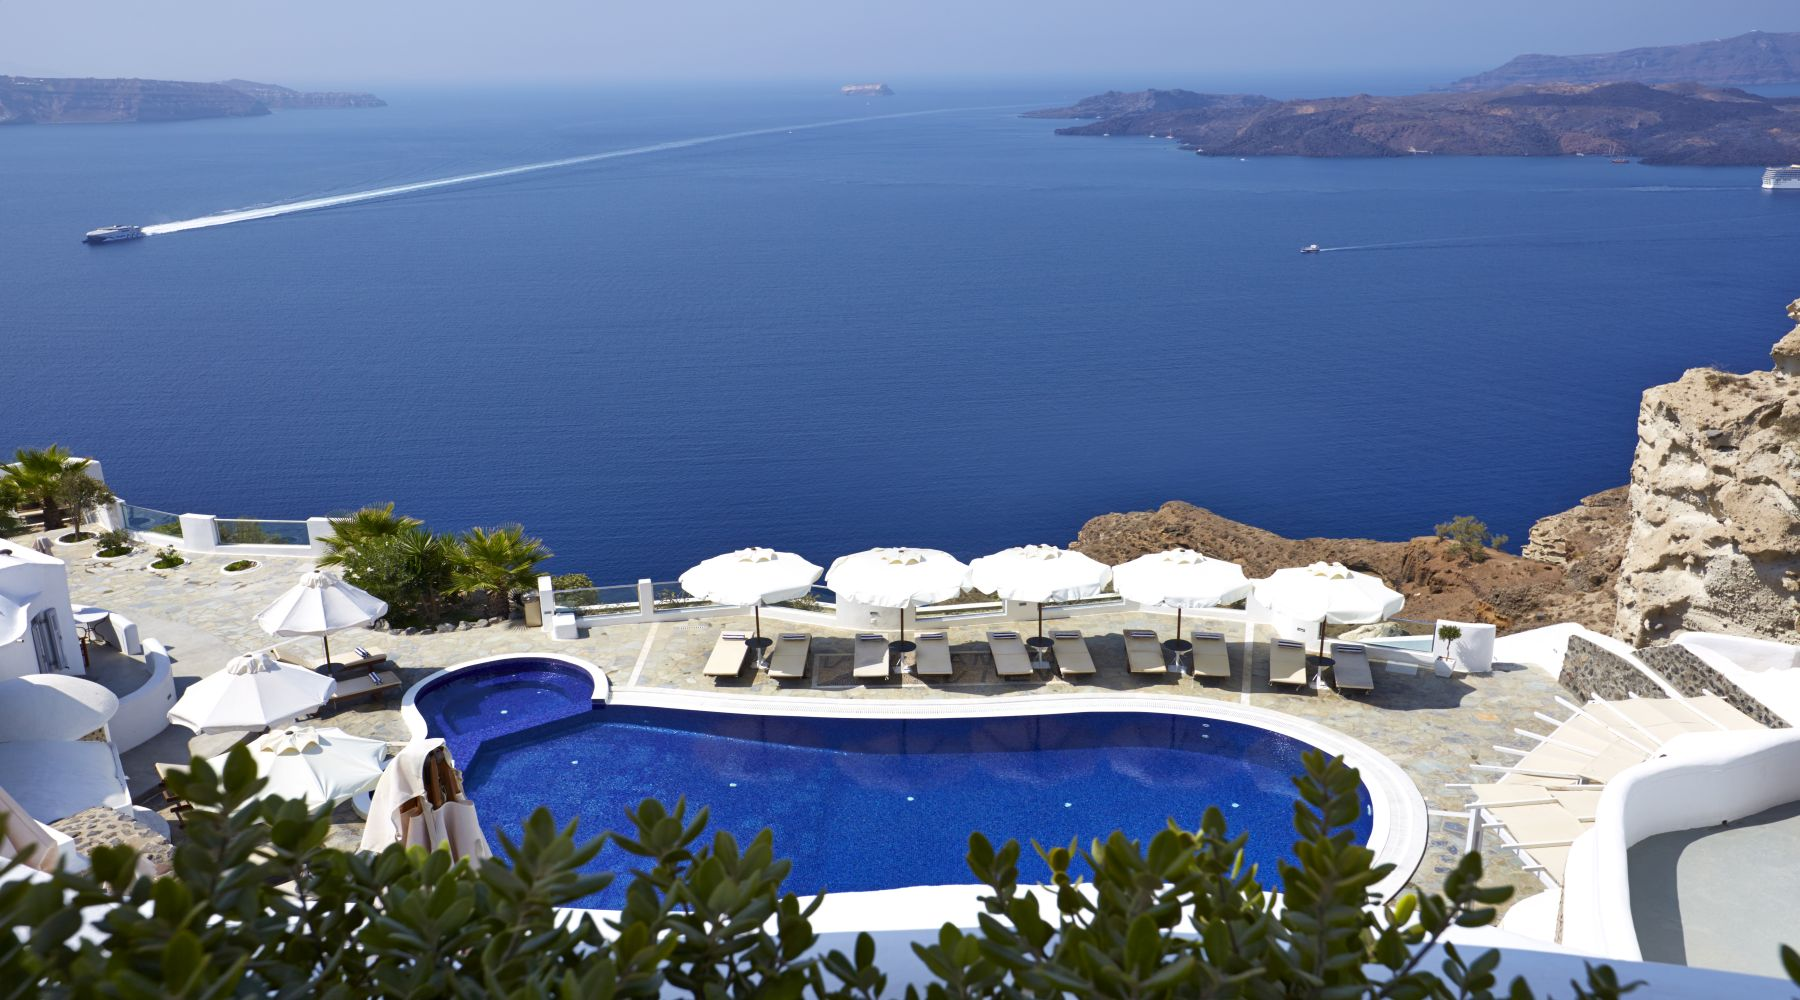 Volcano's View Hotel, Santorini